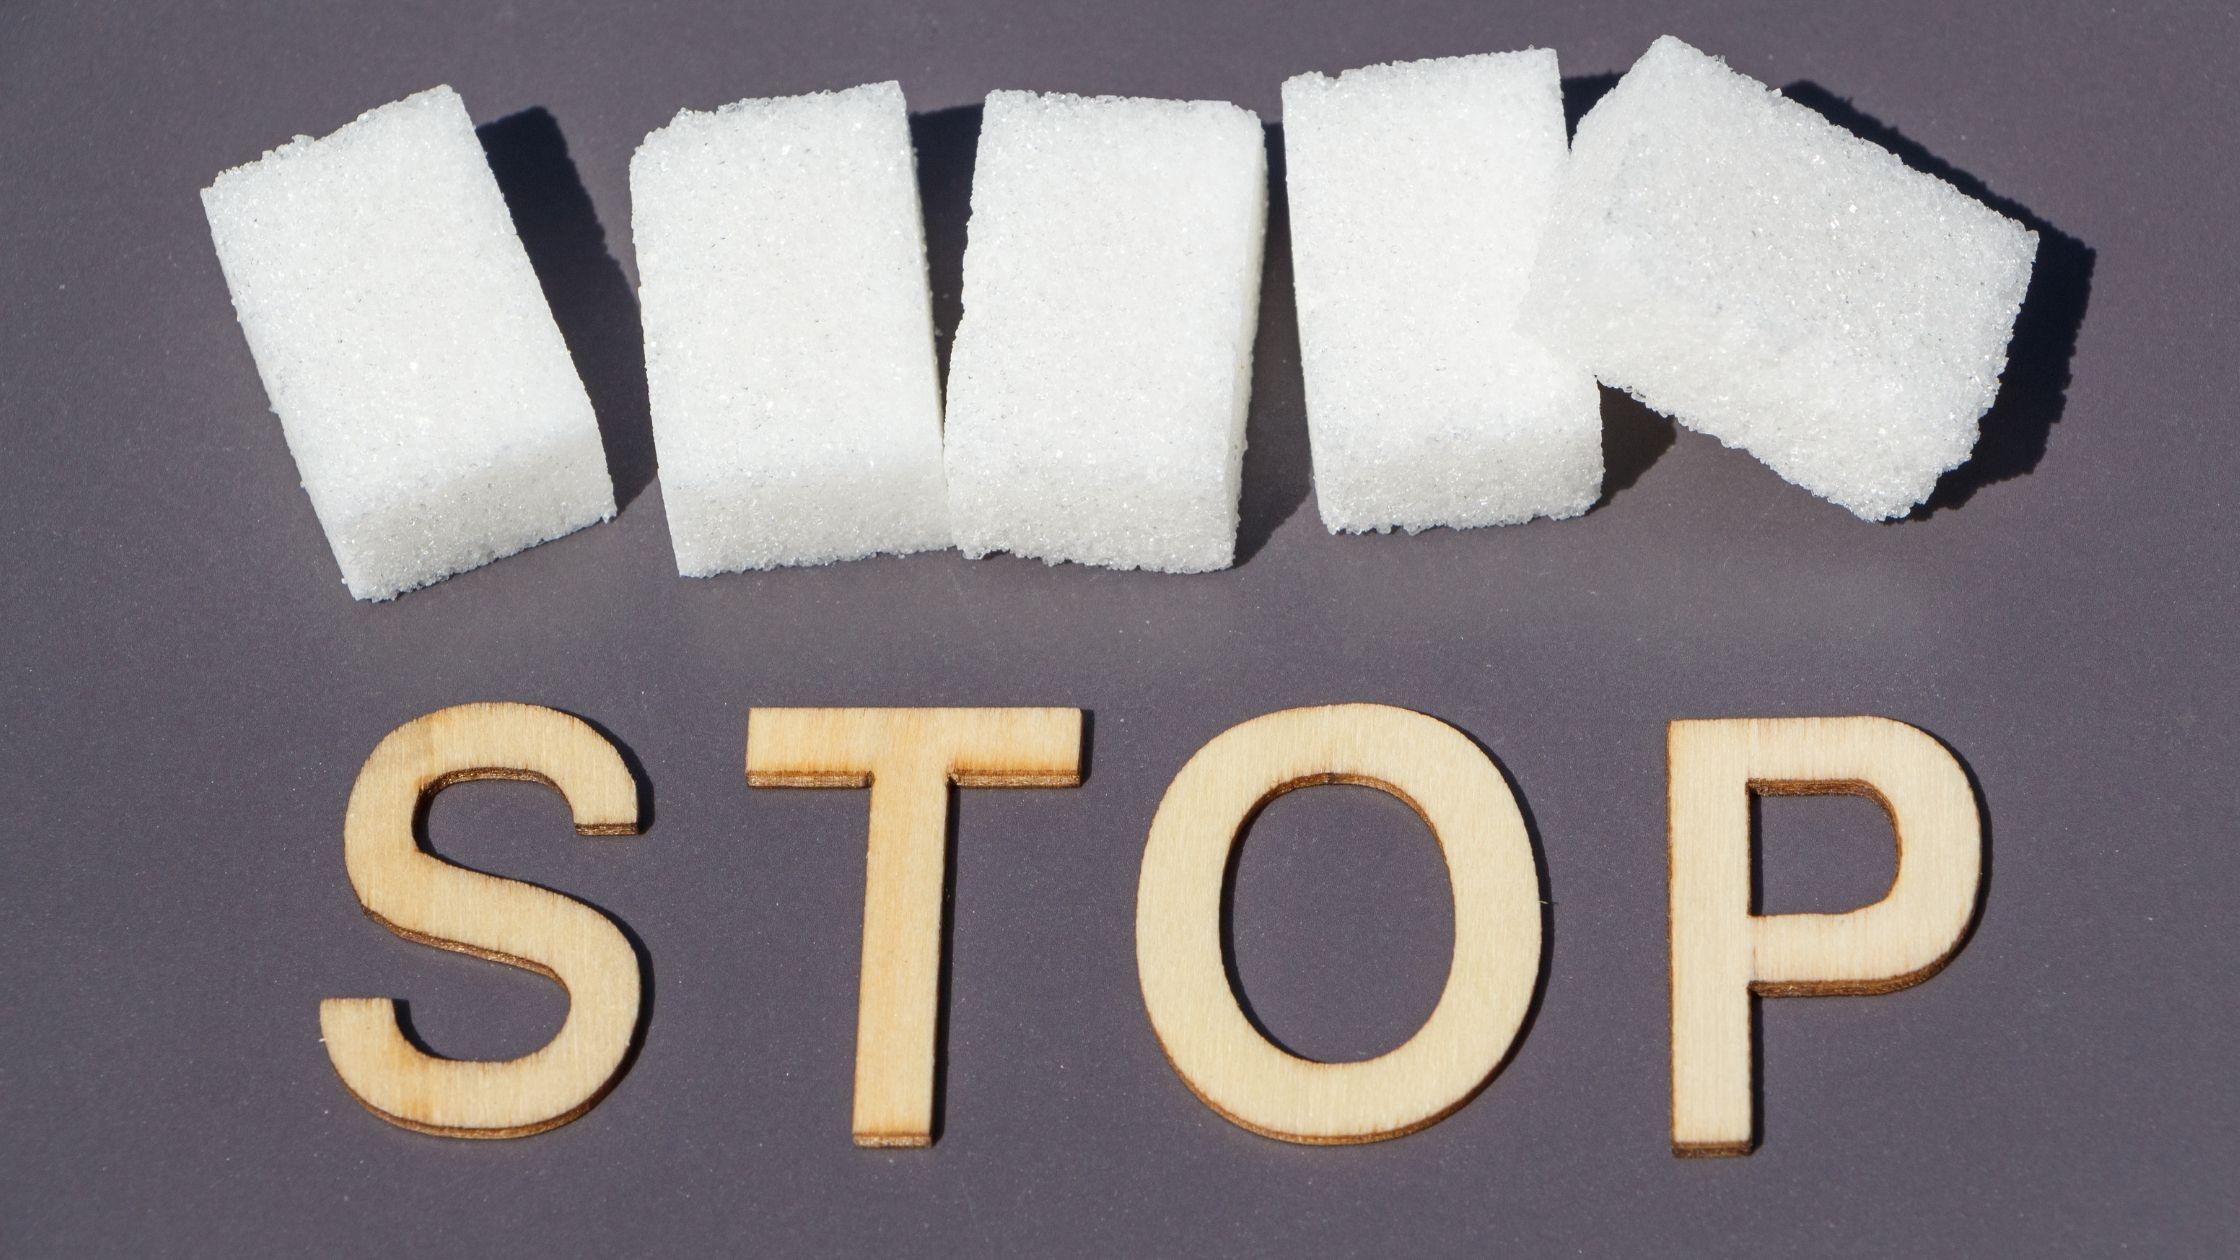 12 Foods with Hidden Sugars